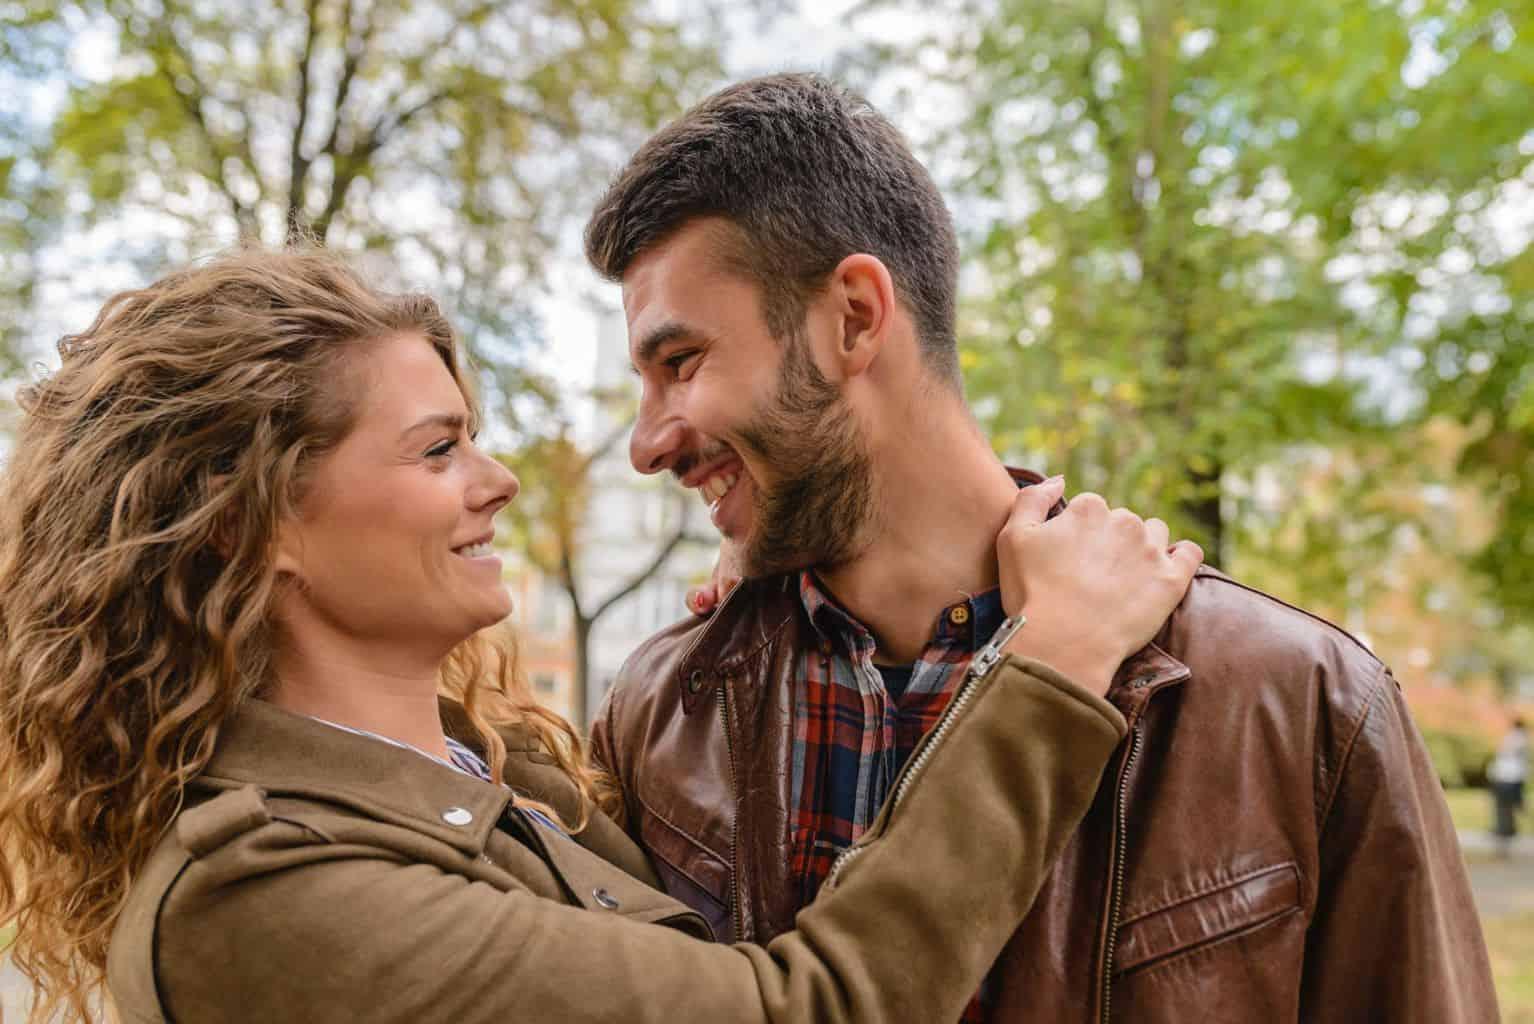 Offene Beziehung Paar Frau lockige Haare Mann Bart